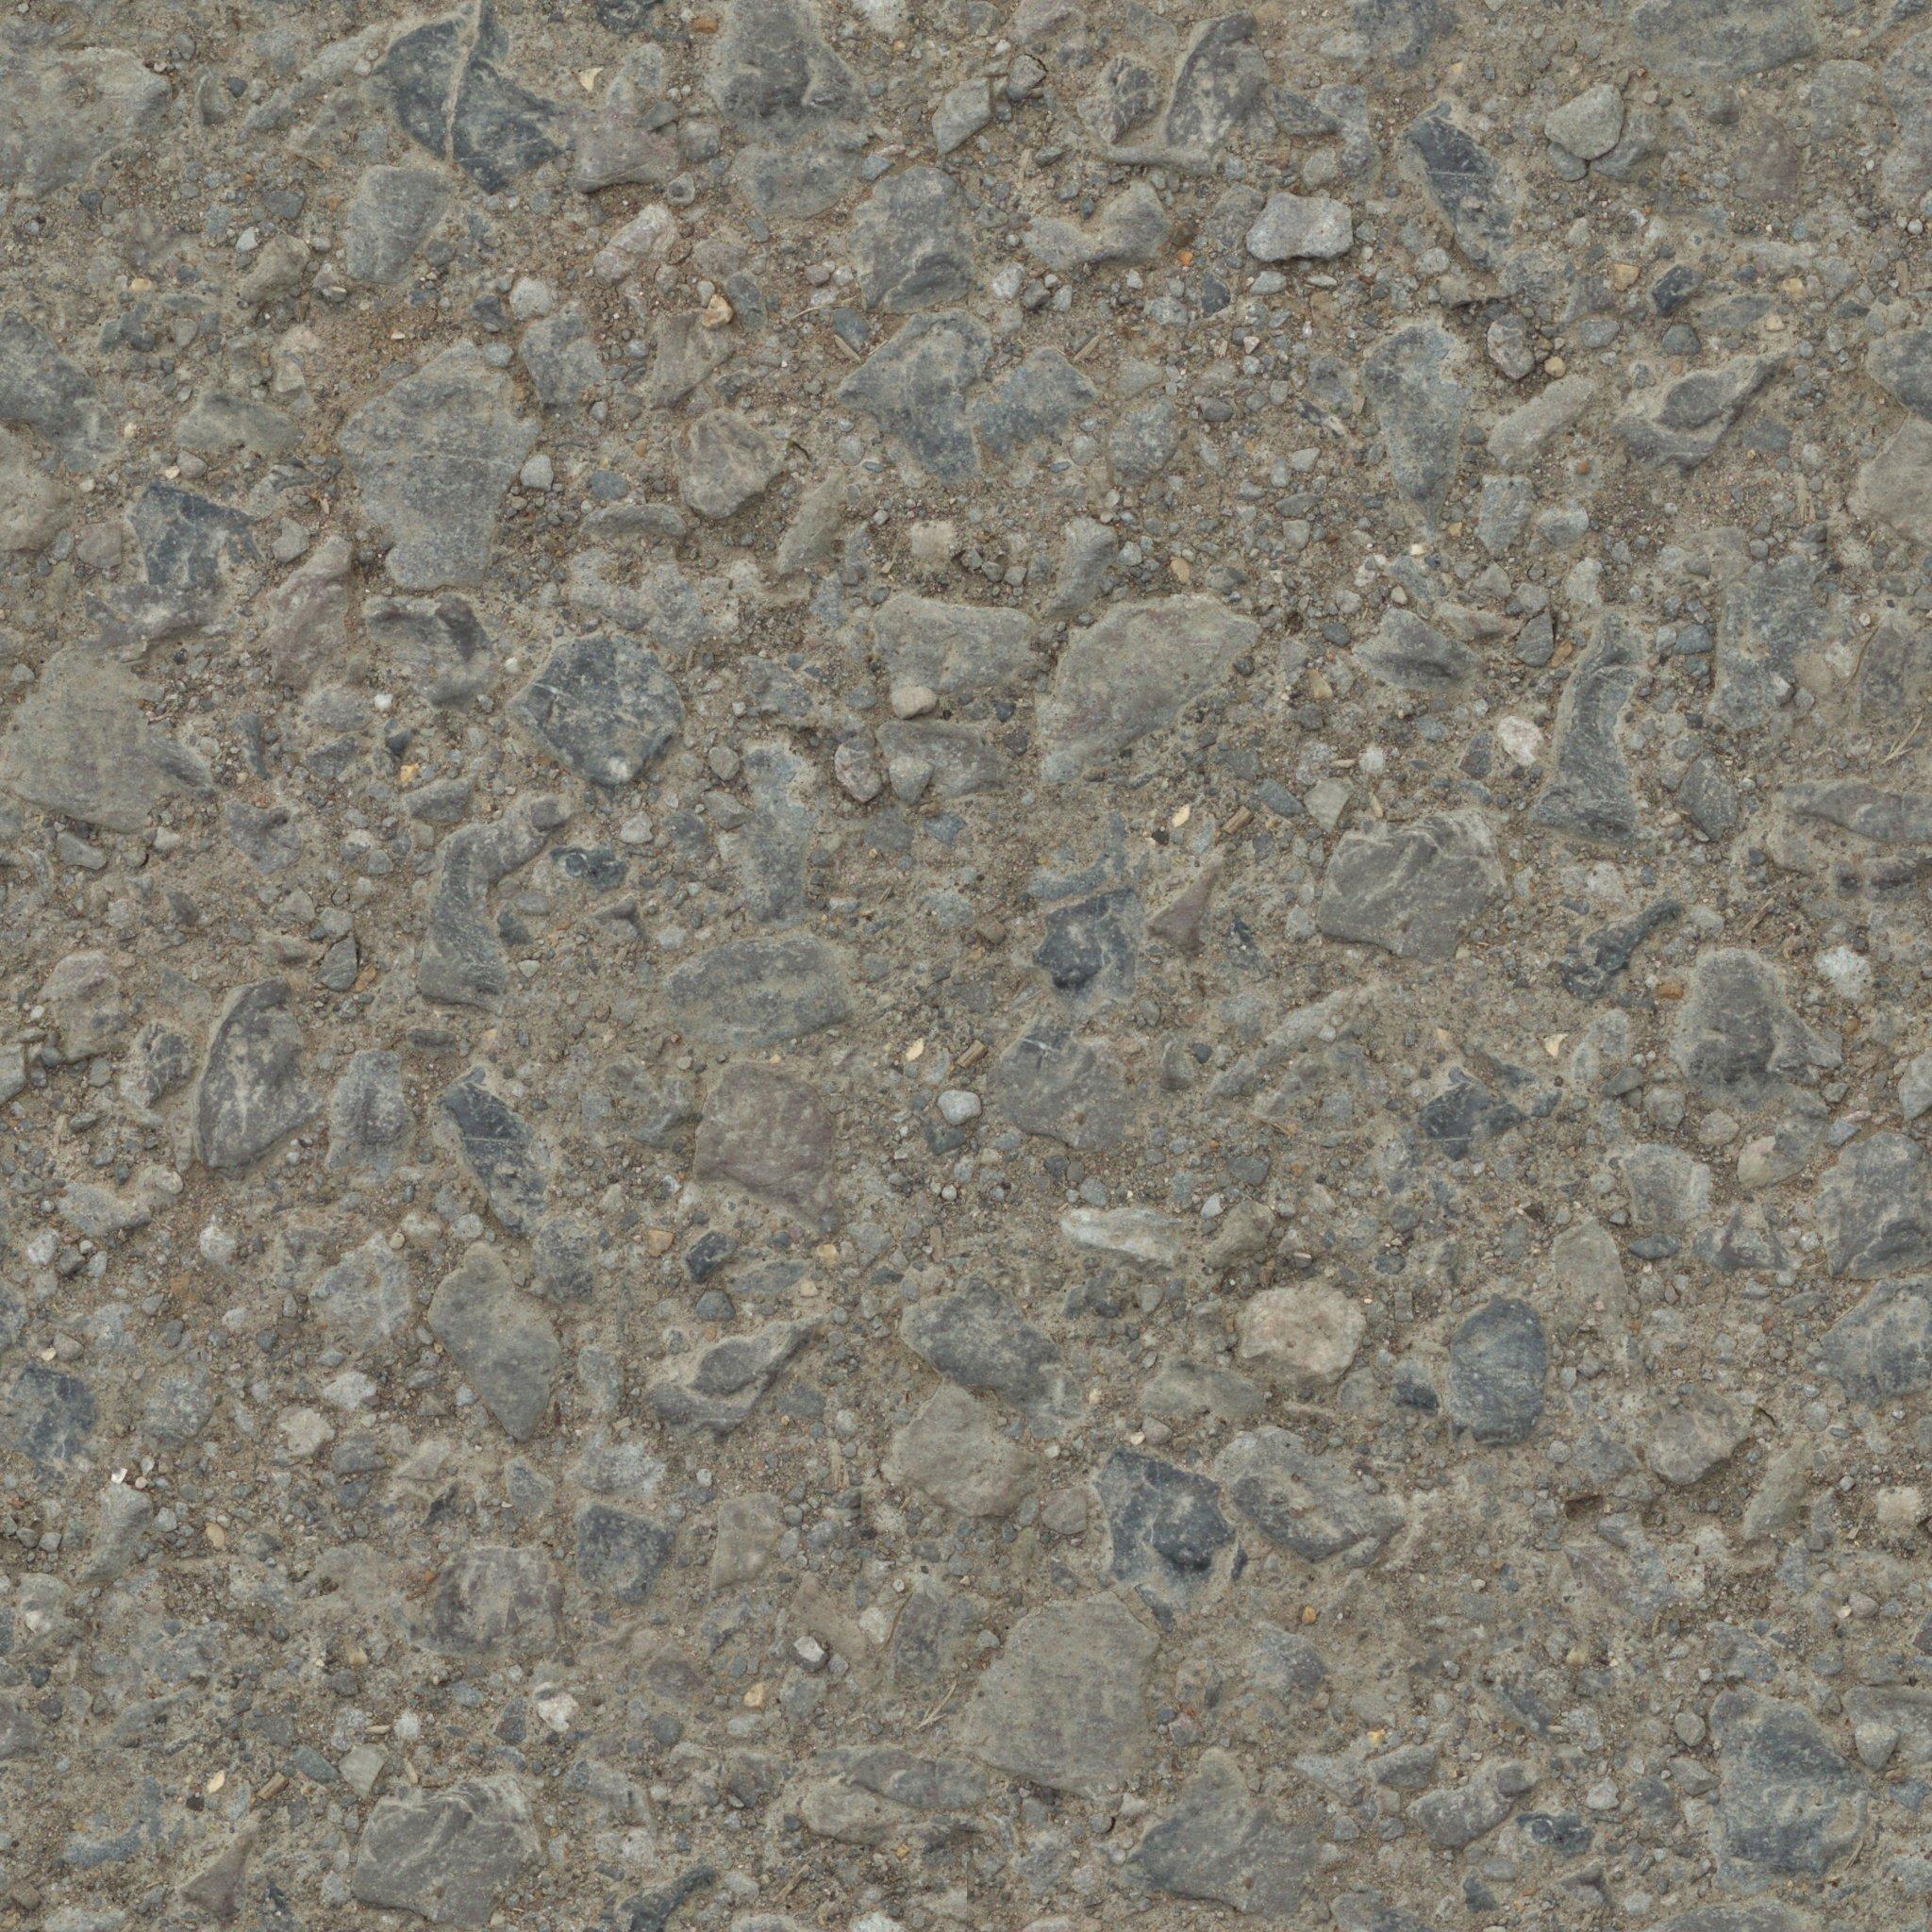 Flooring For Dirt Floor: Ground Texture Tileable 2048x2048